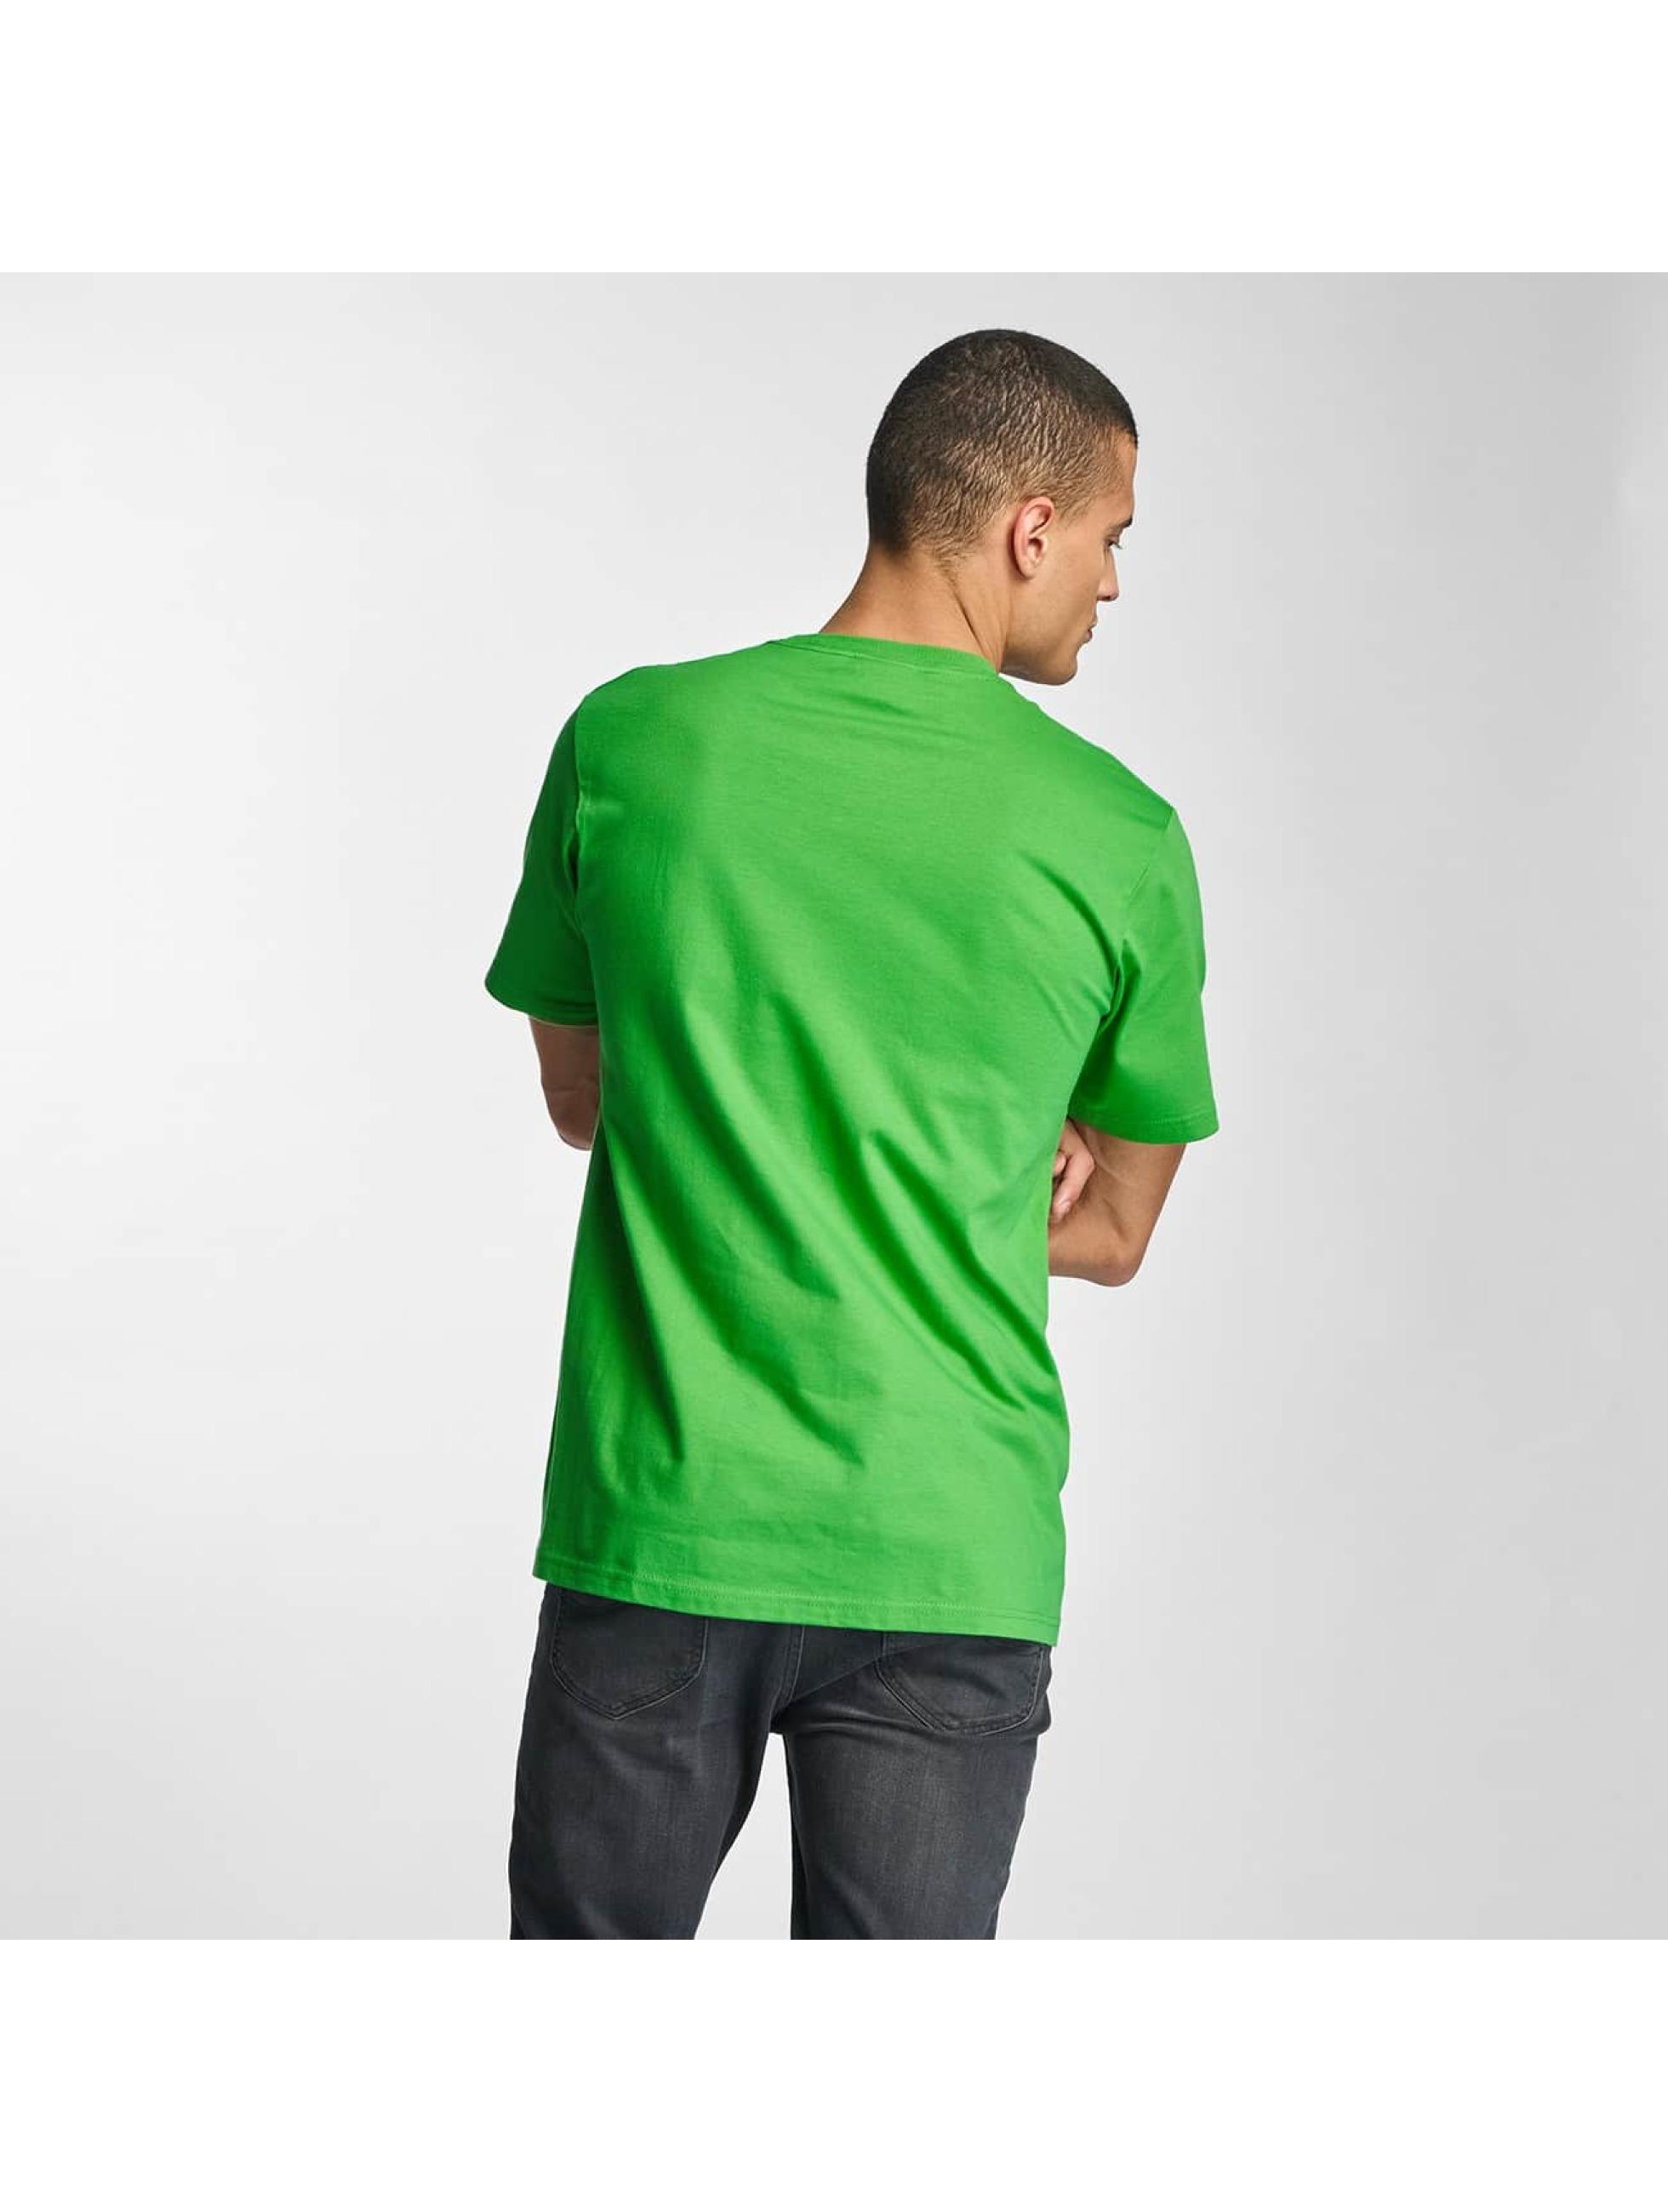 LRG t-shirt Illusion groen